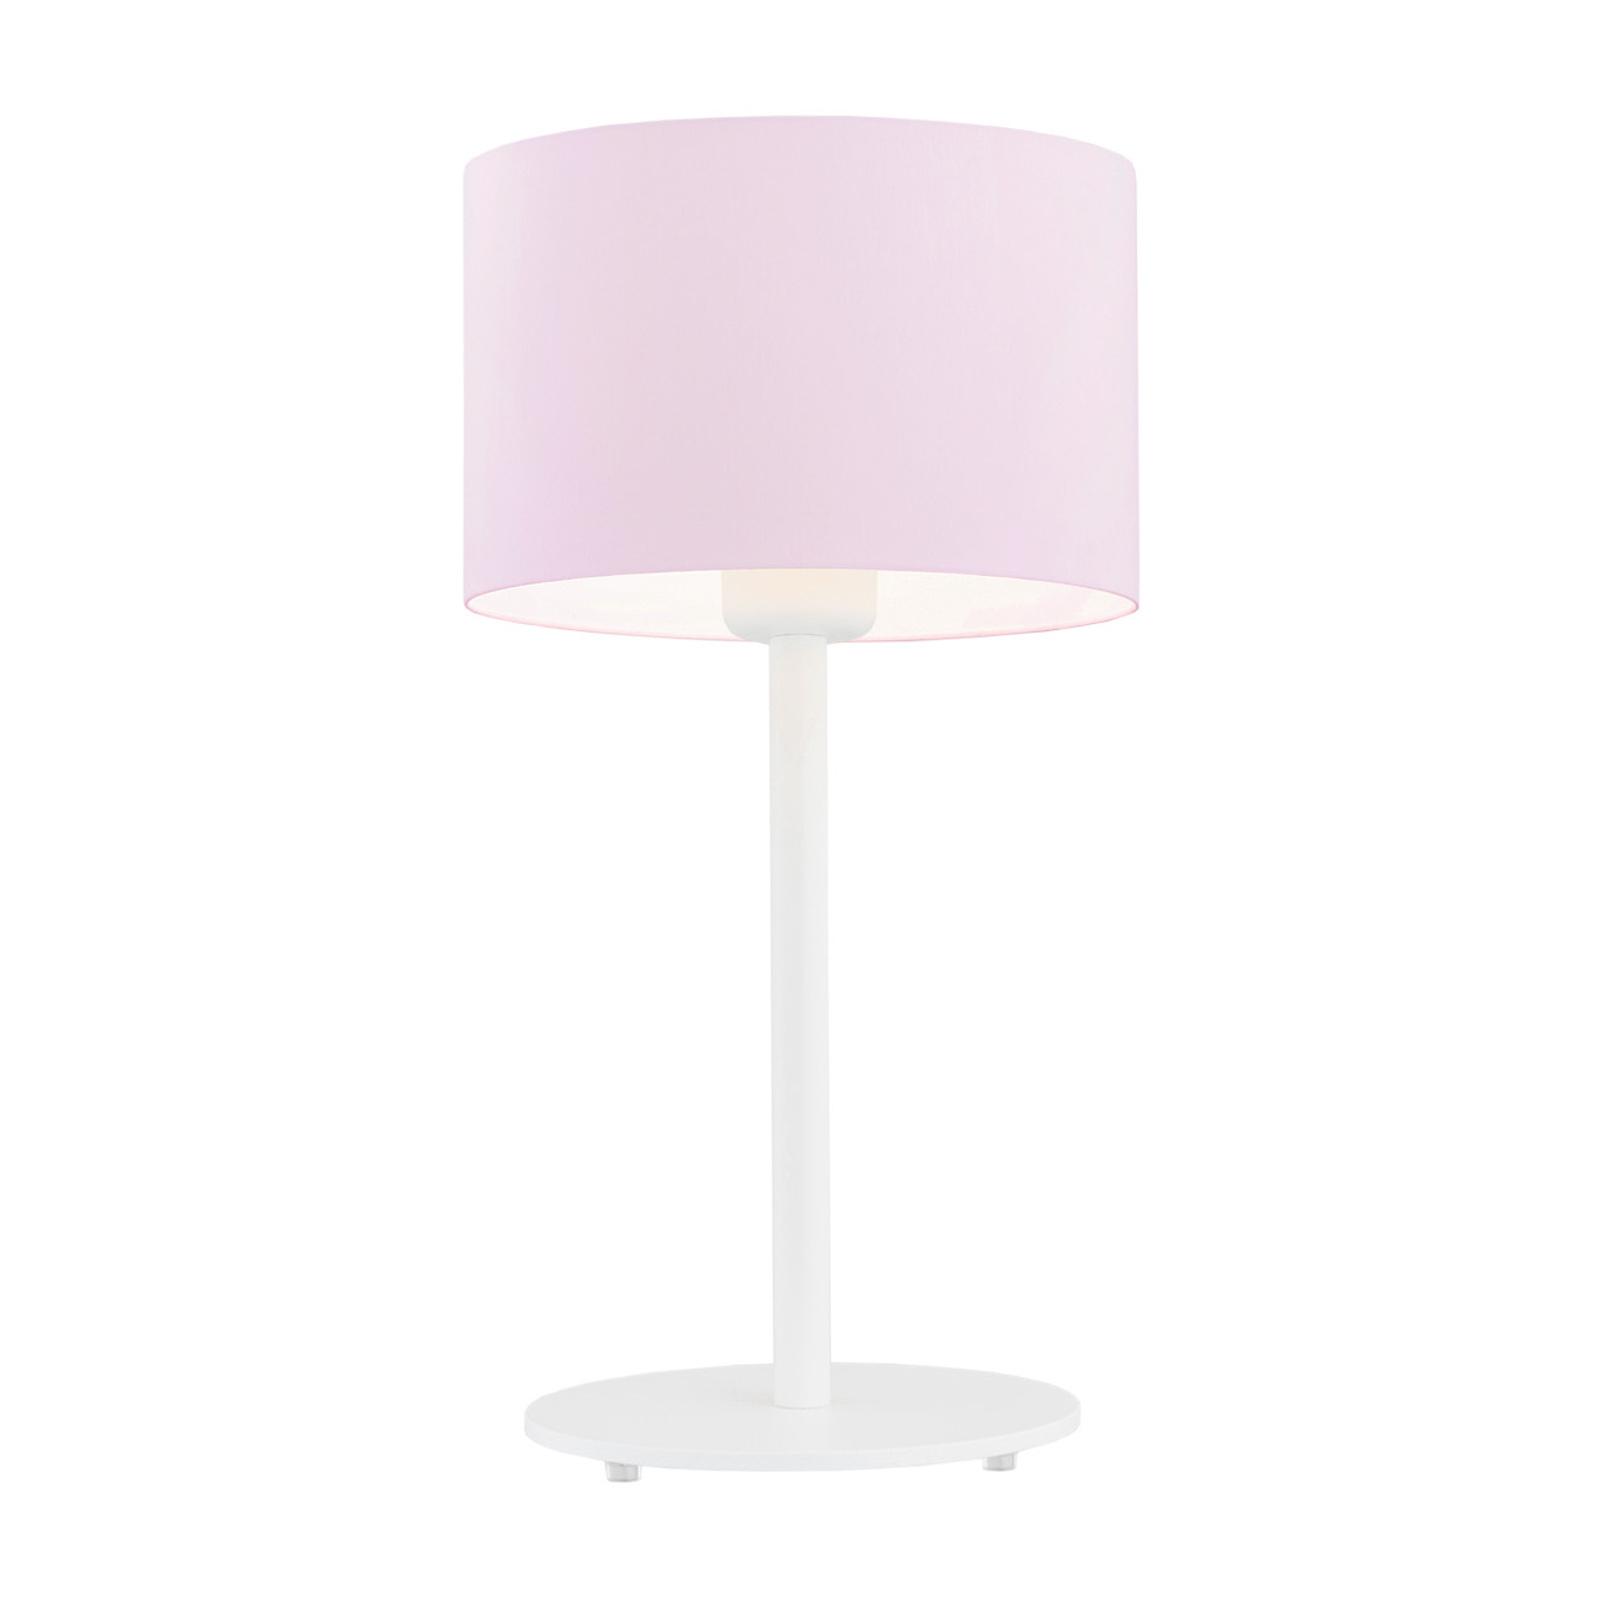 Moa bordlampe, pink stofskærm